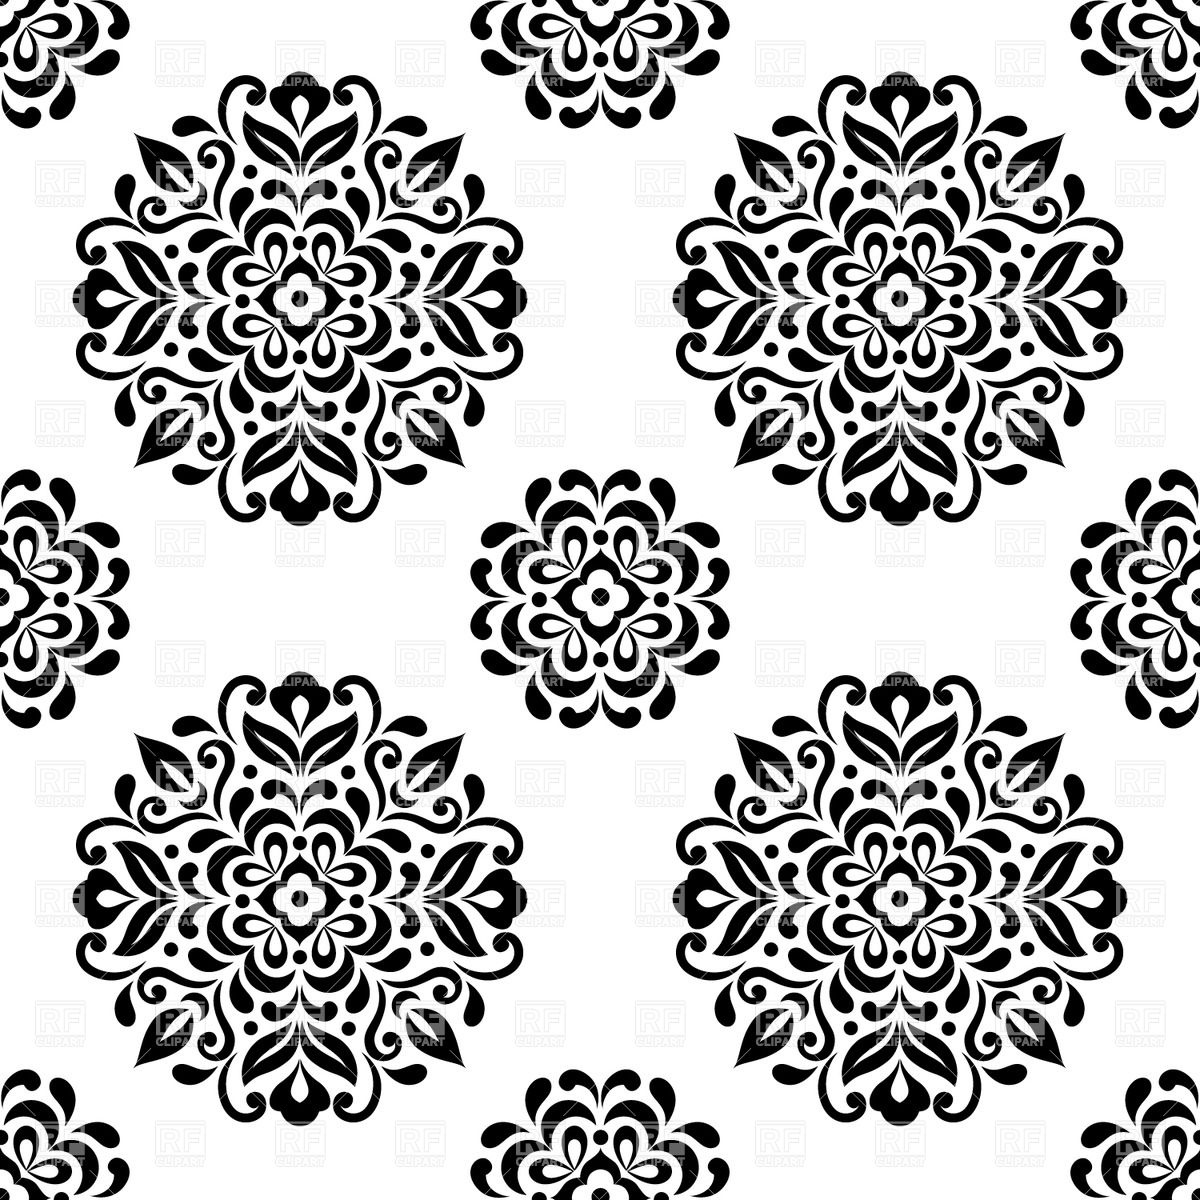 Go Back Images For Mandala Black And White 1200x1200